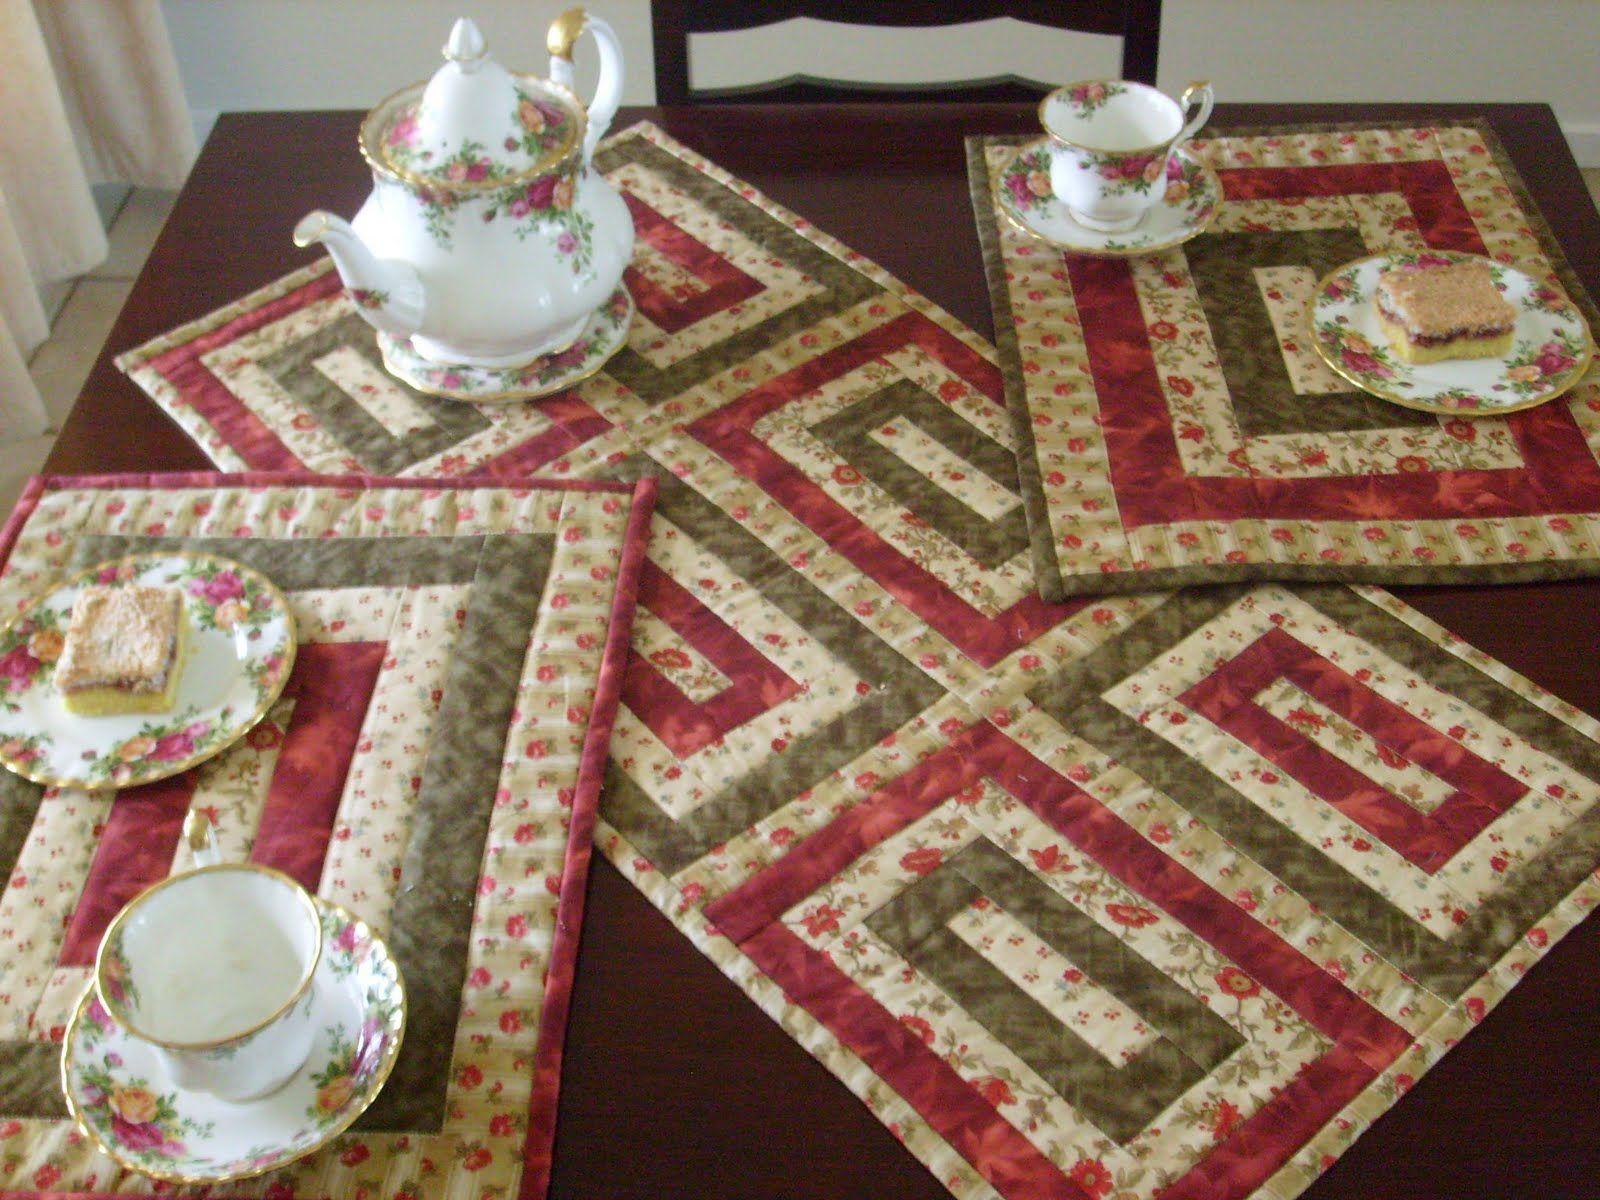 How to sew a table runner - Resultado De Imagem Para Free Table Christmas Runner Patterns